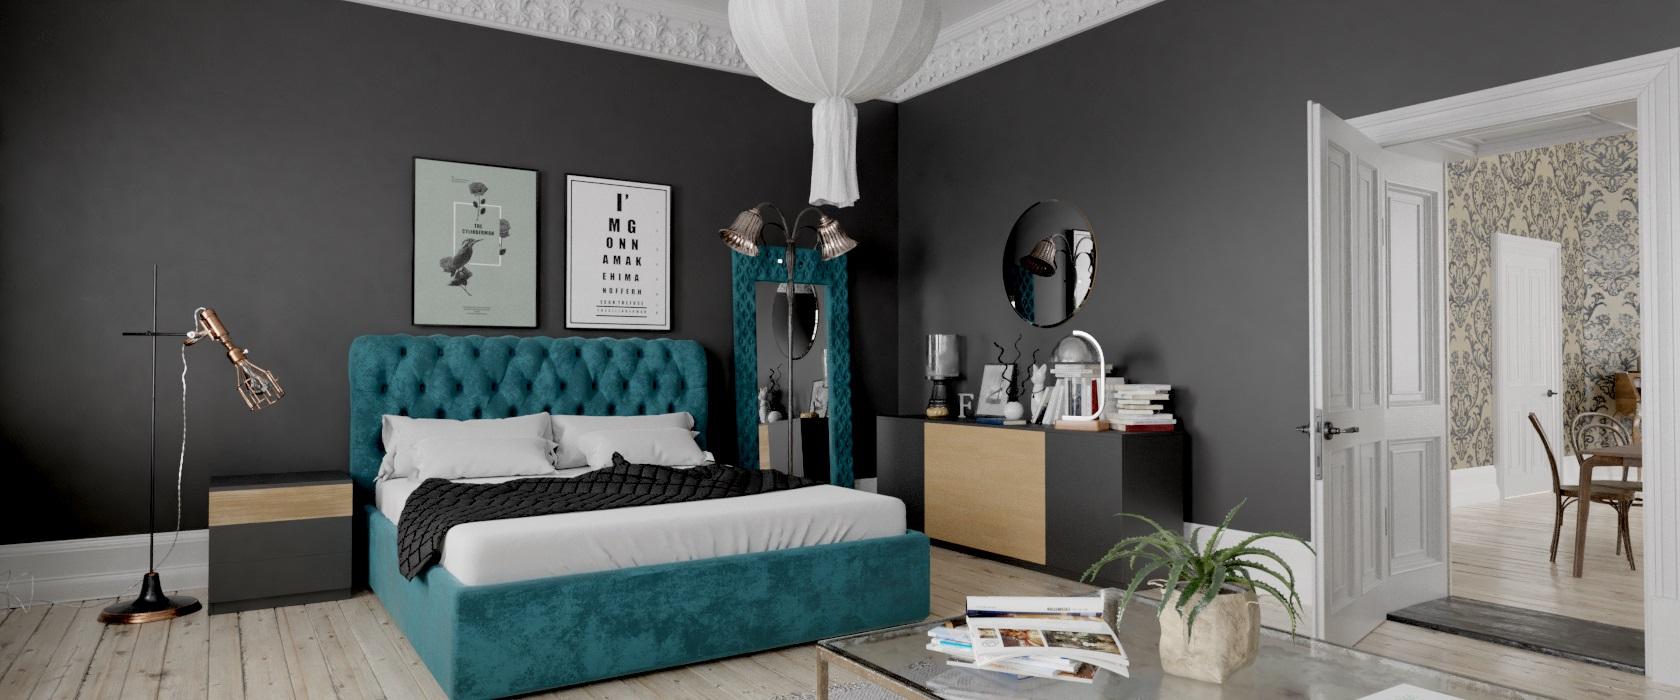 Кровать Milania - Фото 2 - Pufetto